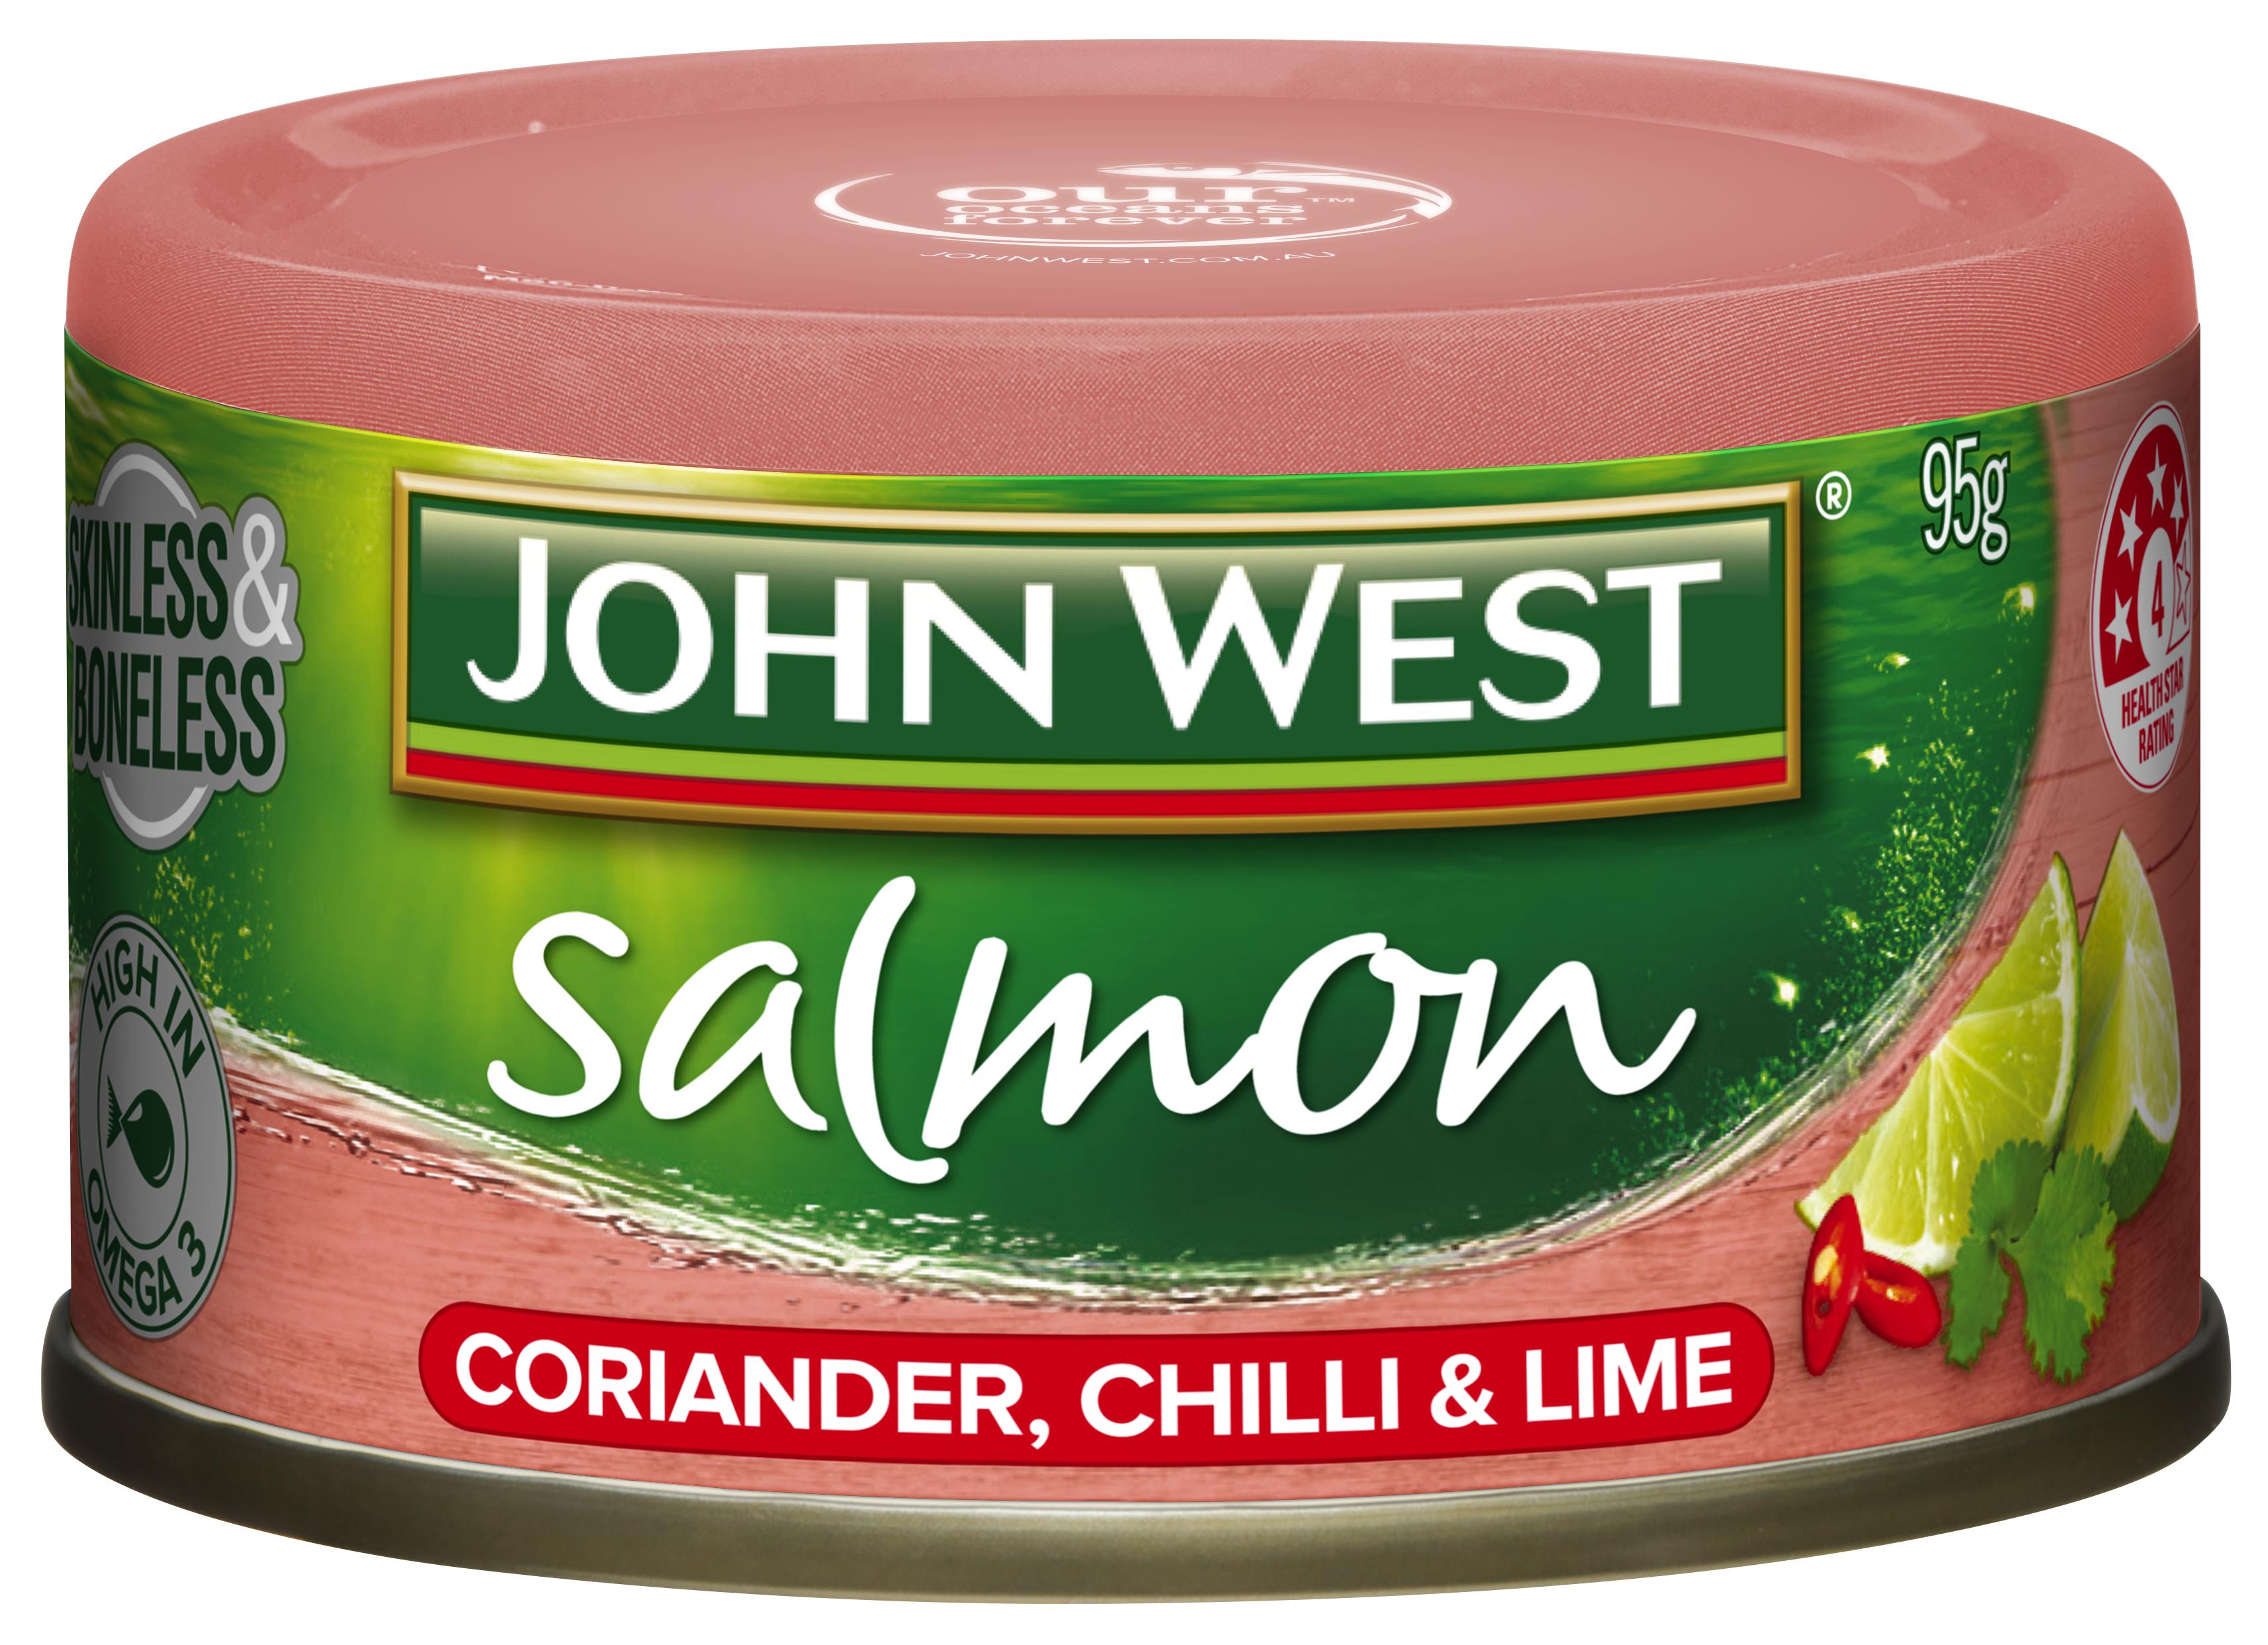 JW Salmon tempter coriander chilli lime 95g